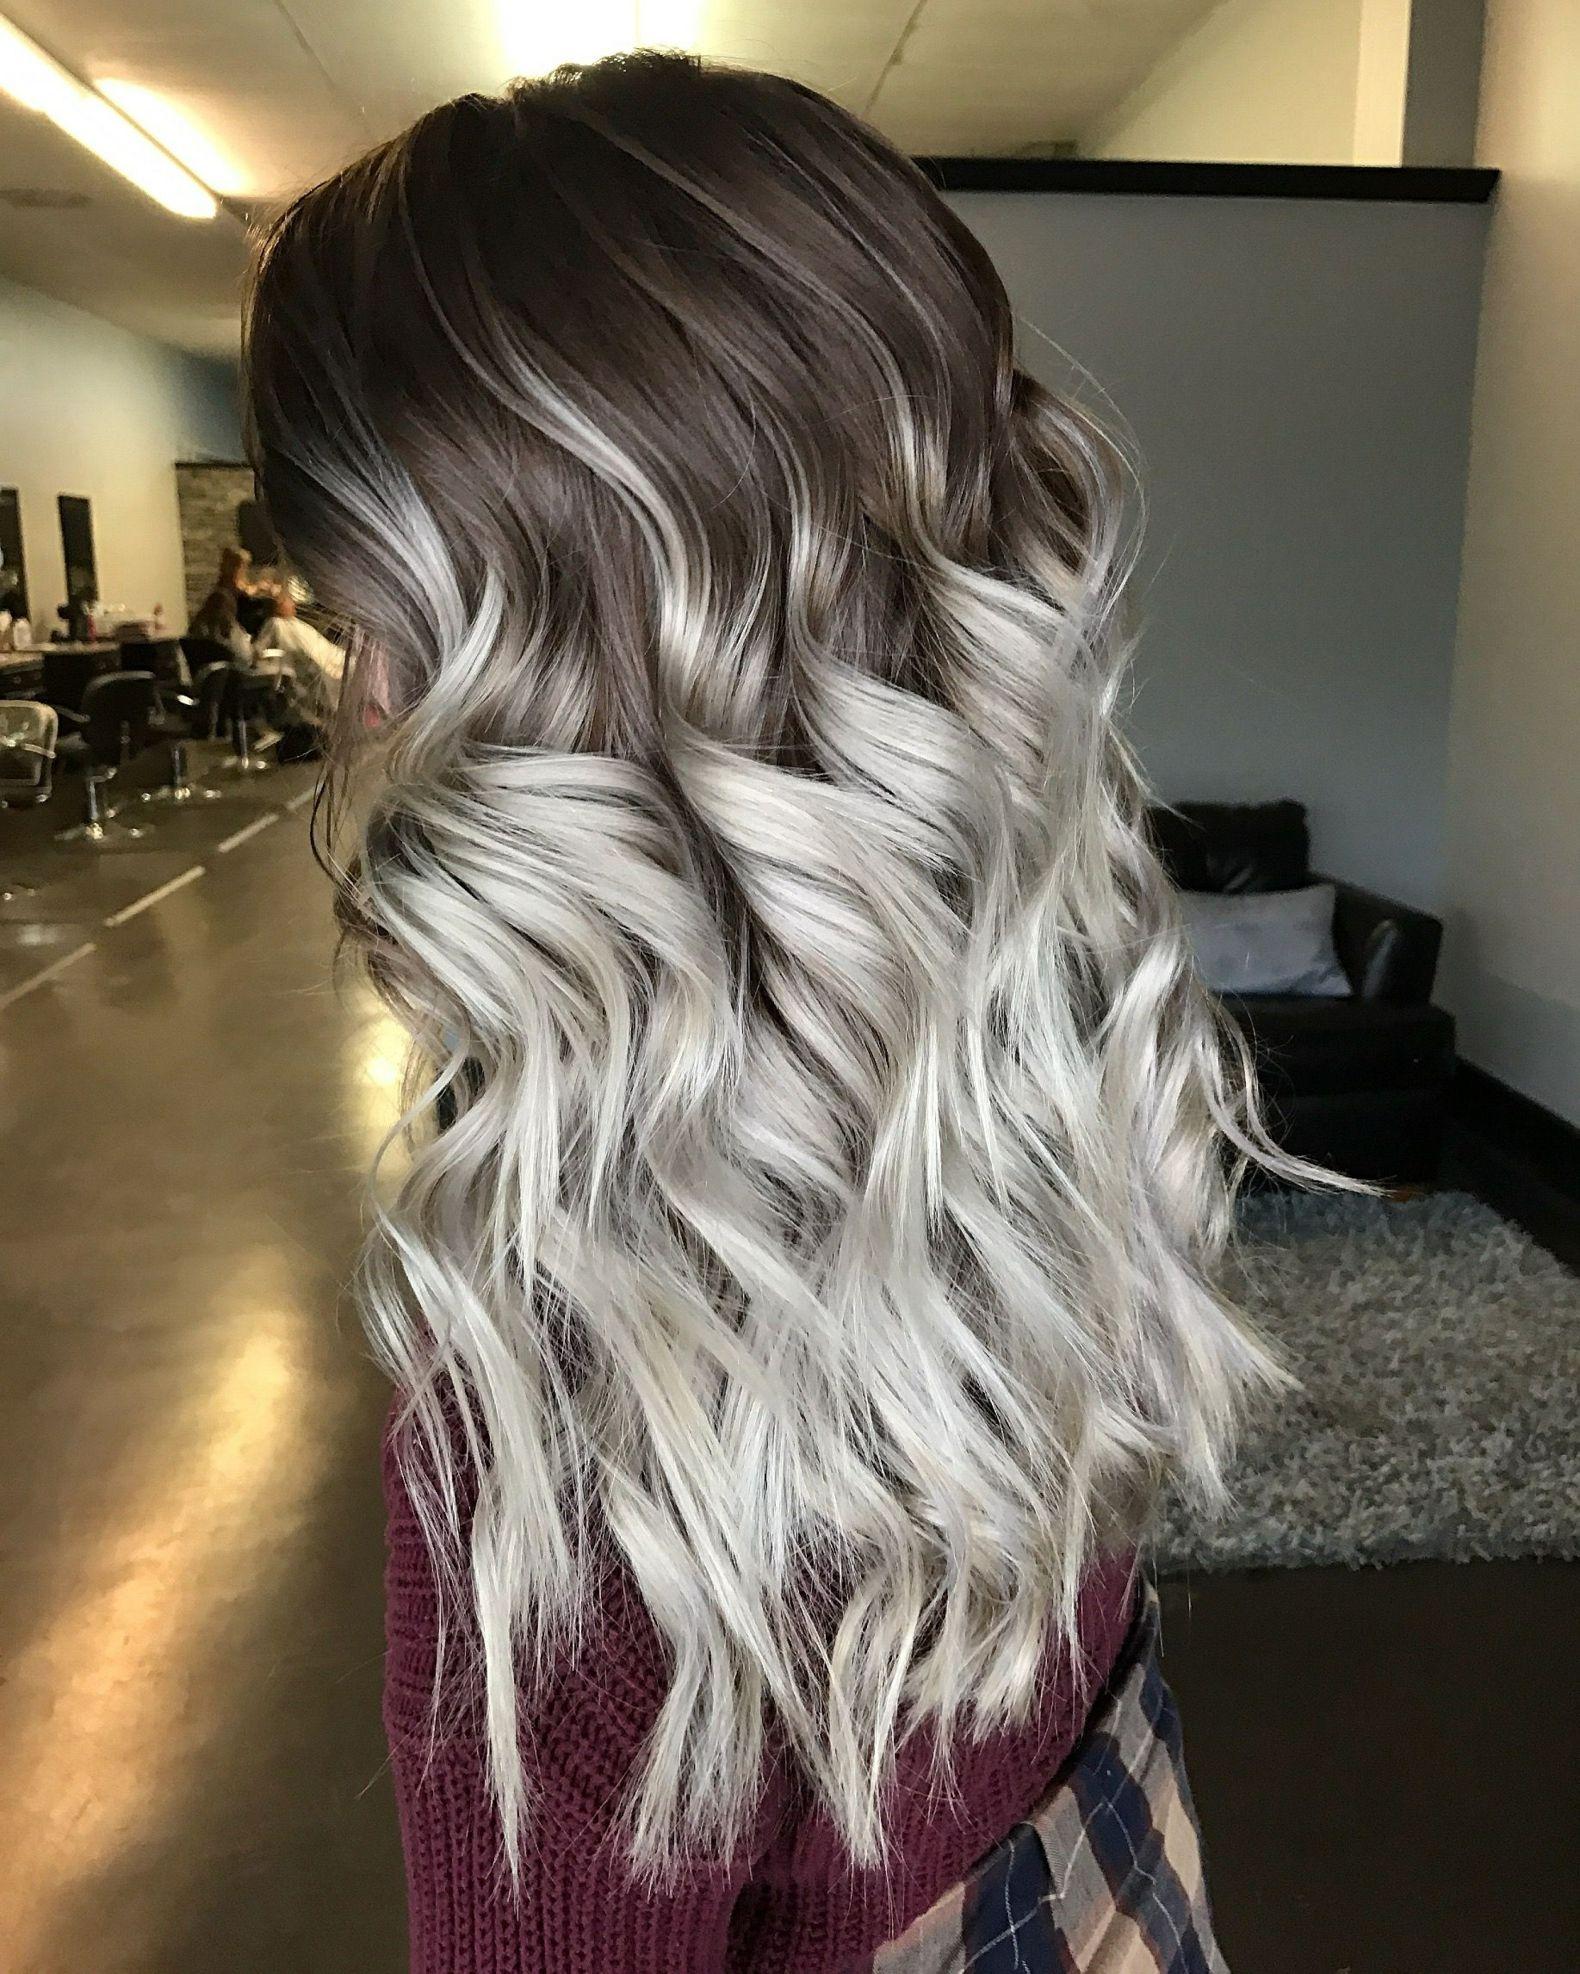 dunkler Ansatz Ombre Look Frisuren Frauen #haare #silber #